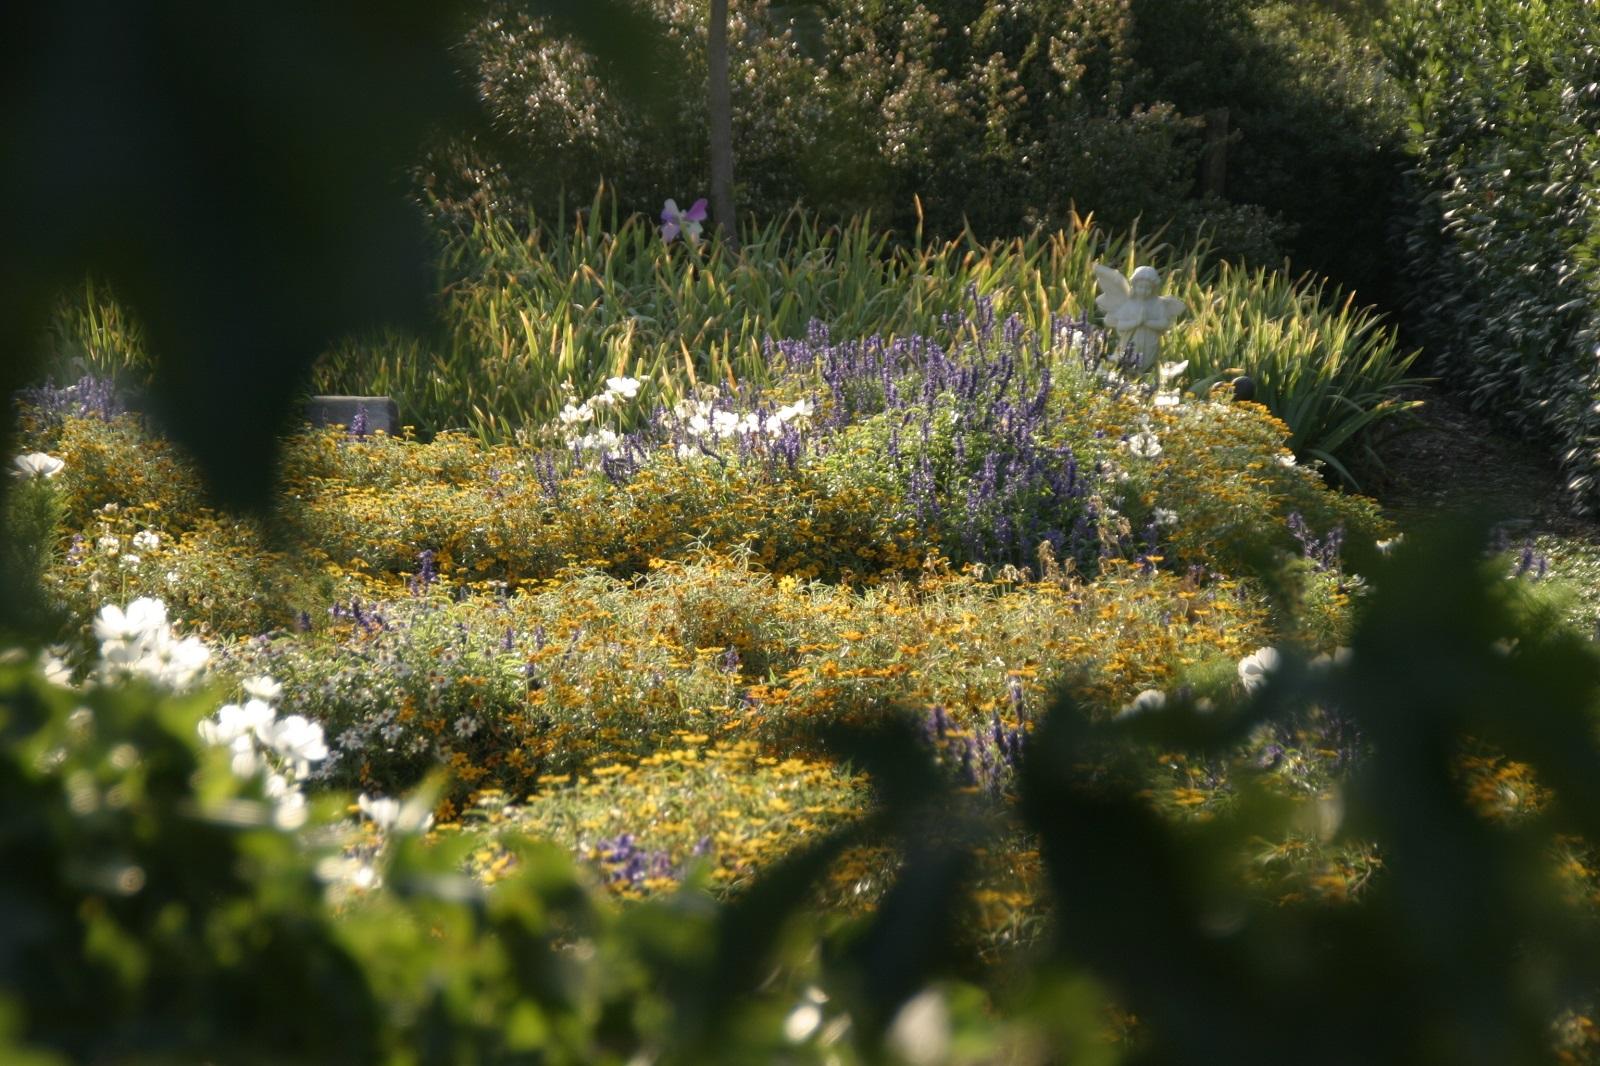 Il giardino segreto il giardino segreto u waiting posthuman studio il giardino segreto bed - Il giardino segreto streaming ...